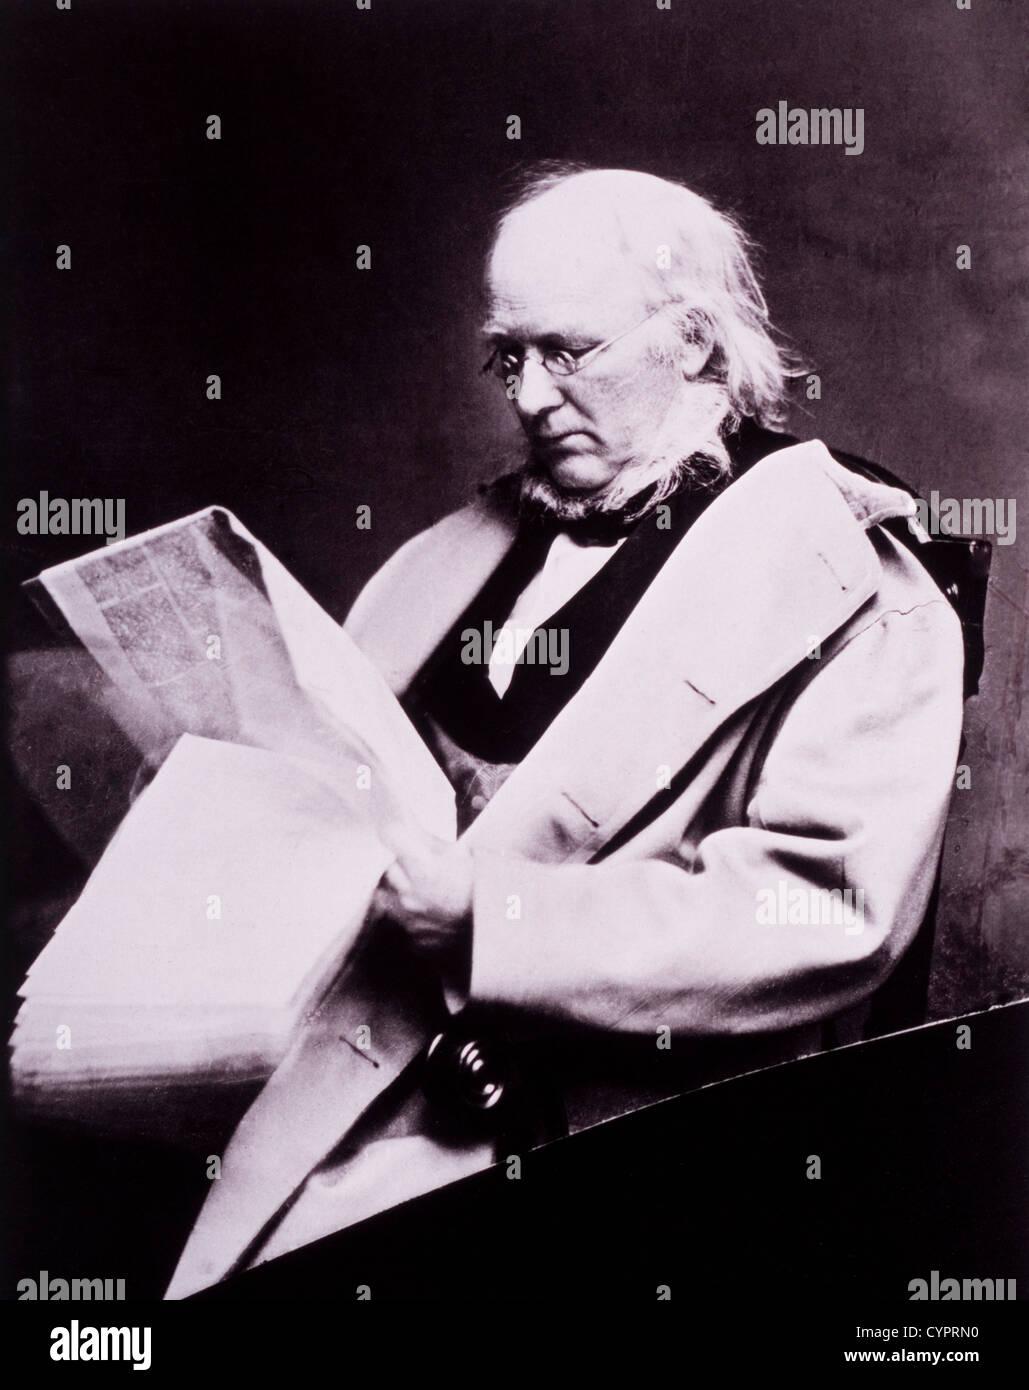 Horace Greeley (1811-1872), Reading Newspaper, Portrait by Mathew Brady, Circa 1865 - Stock Image